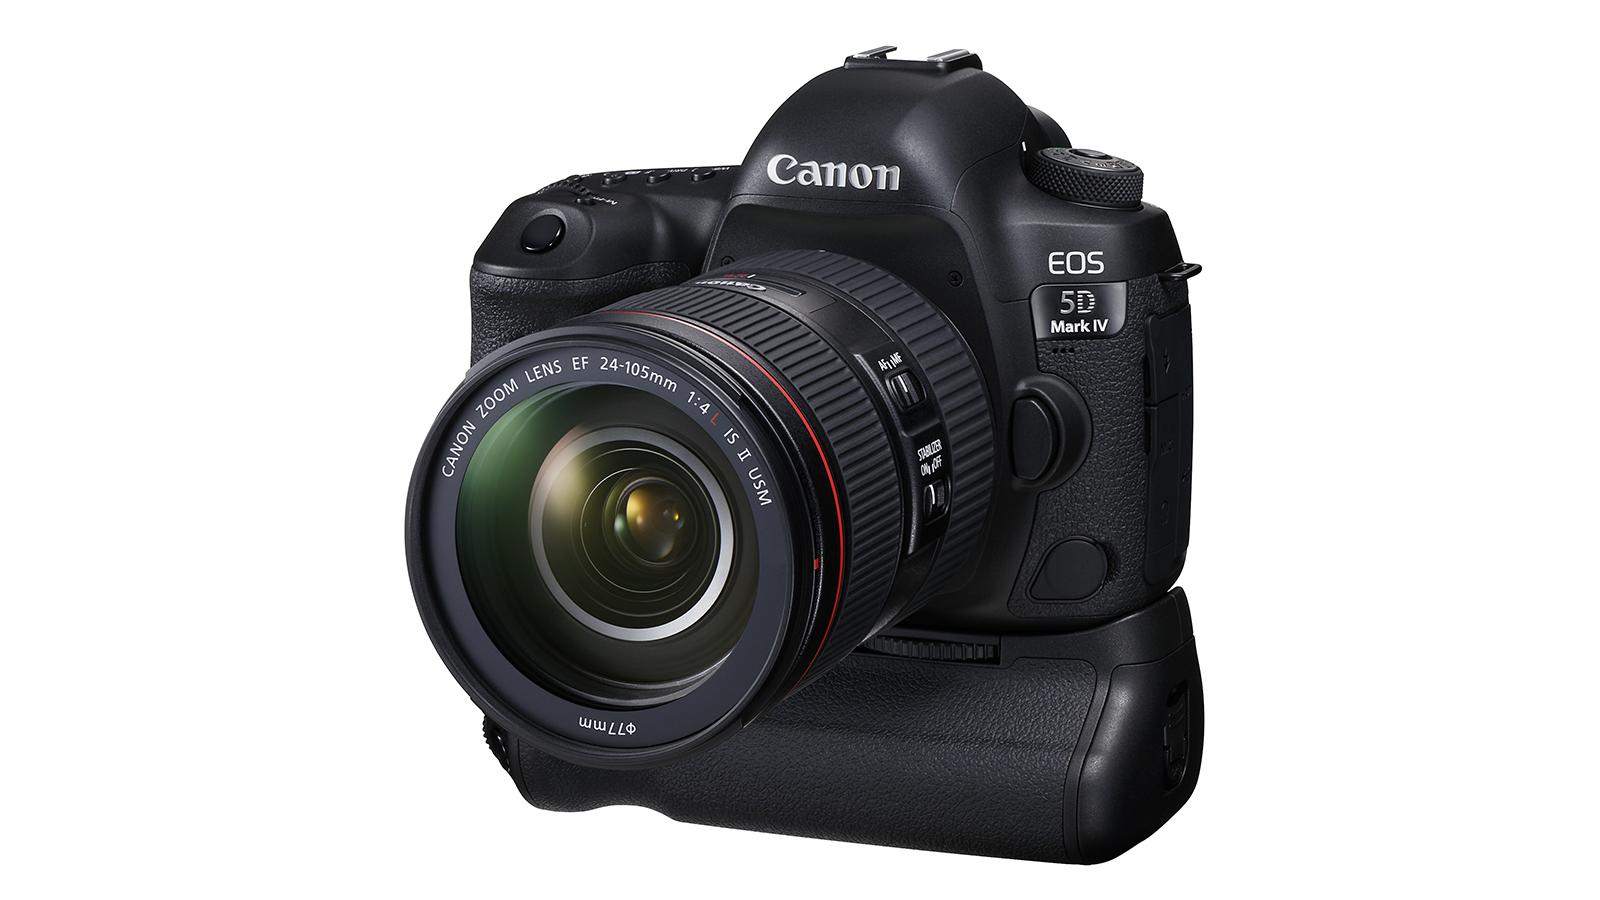 canon-eos-5d-mark-IV-011-eesttallaga